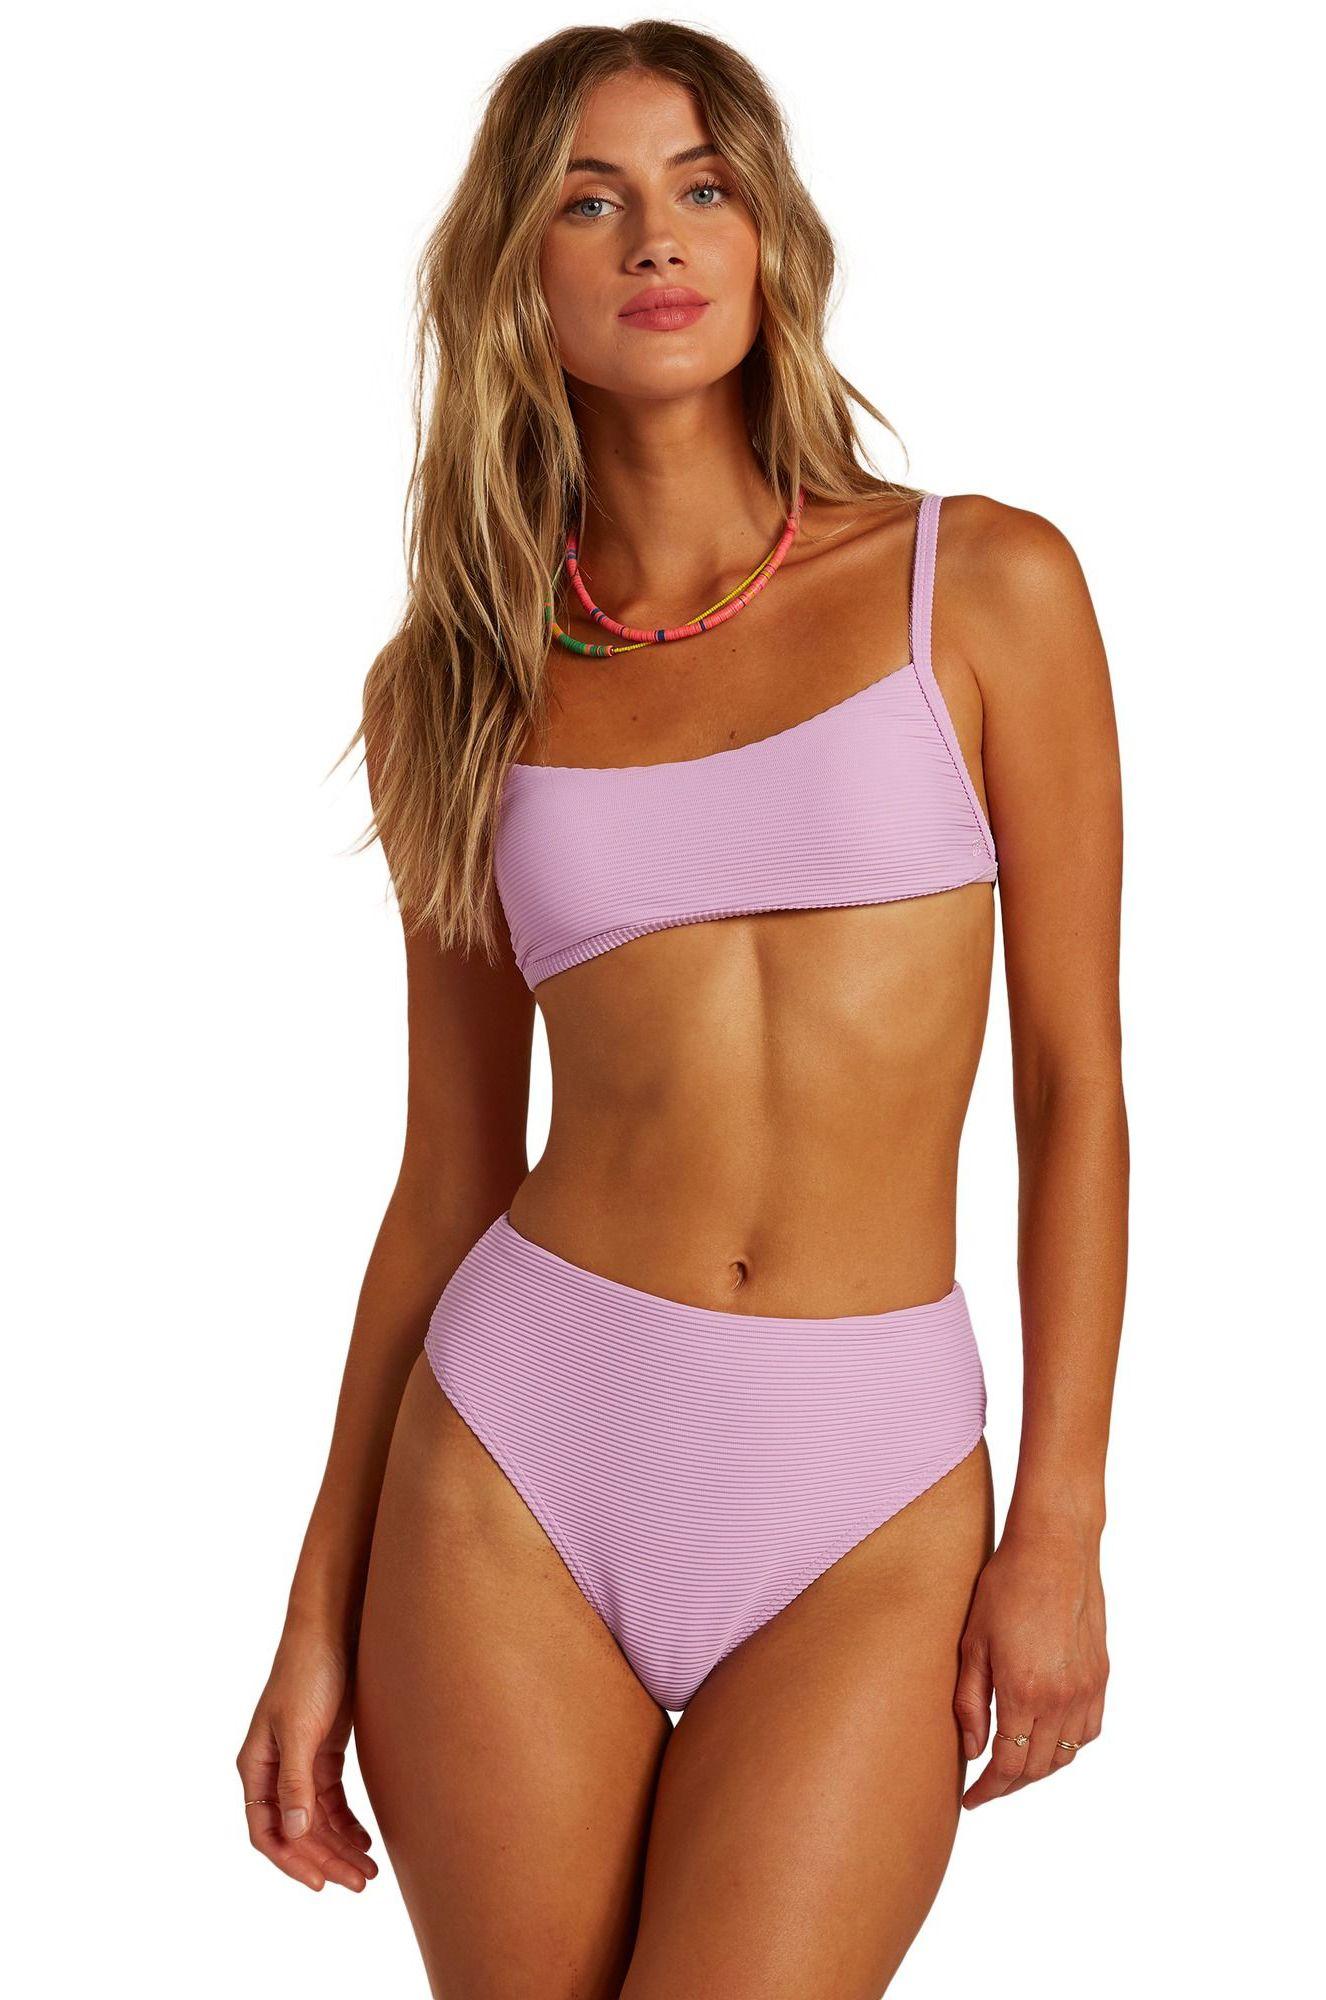 Bikini Top Billabong TANLINES BRALETTE SURFADELIC Lit Up Lilac